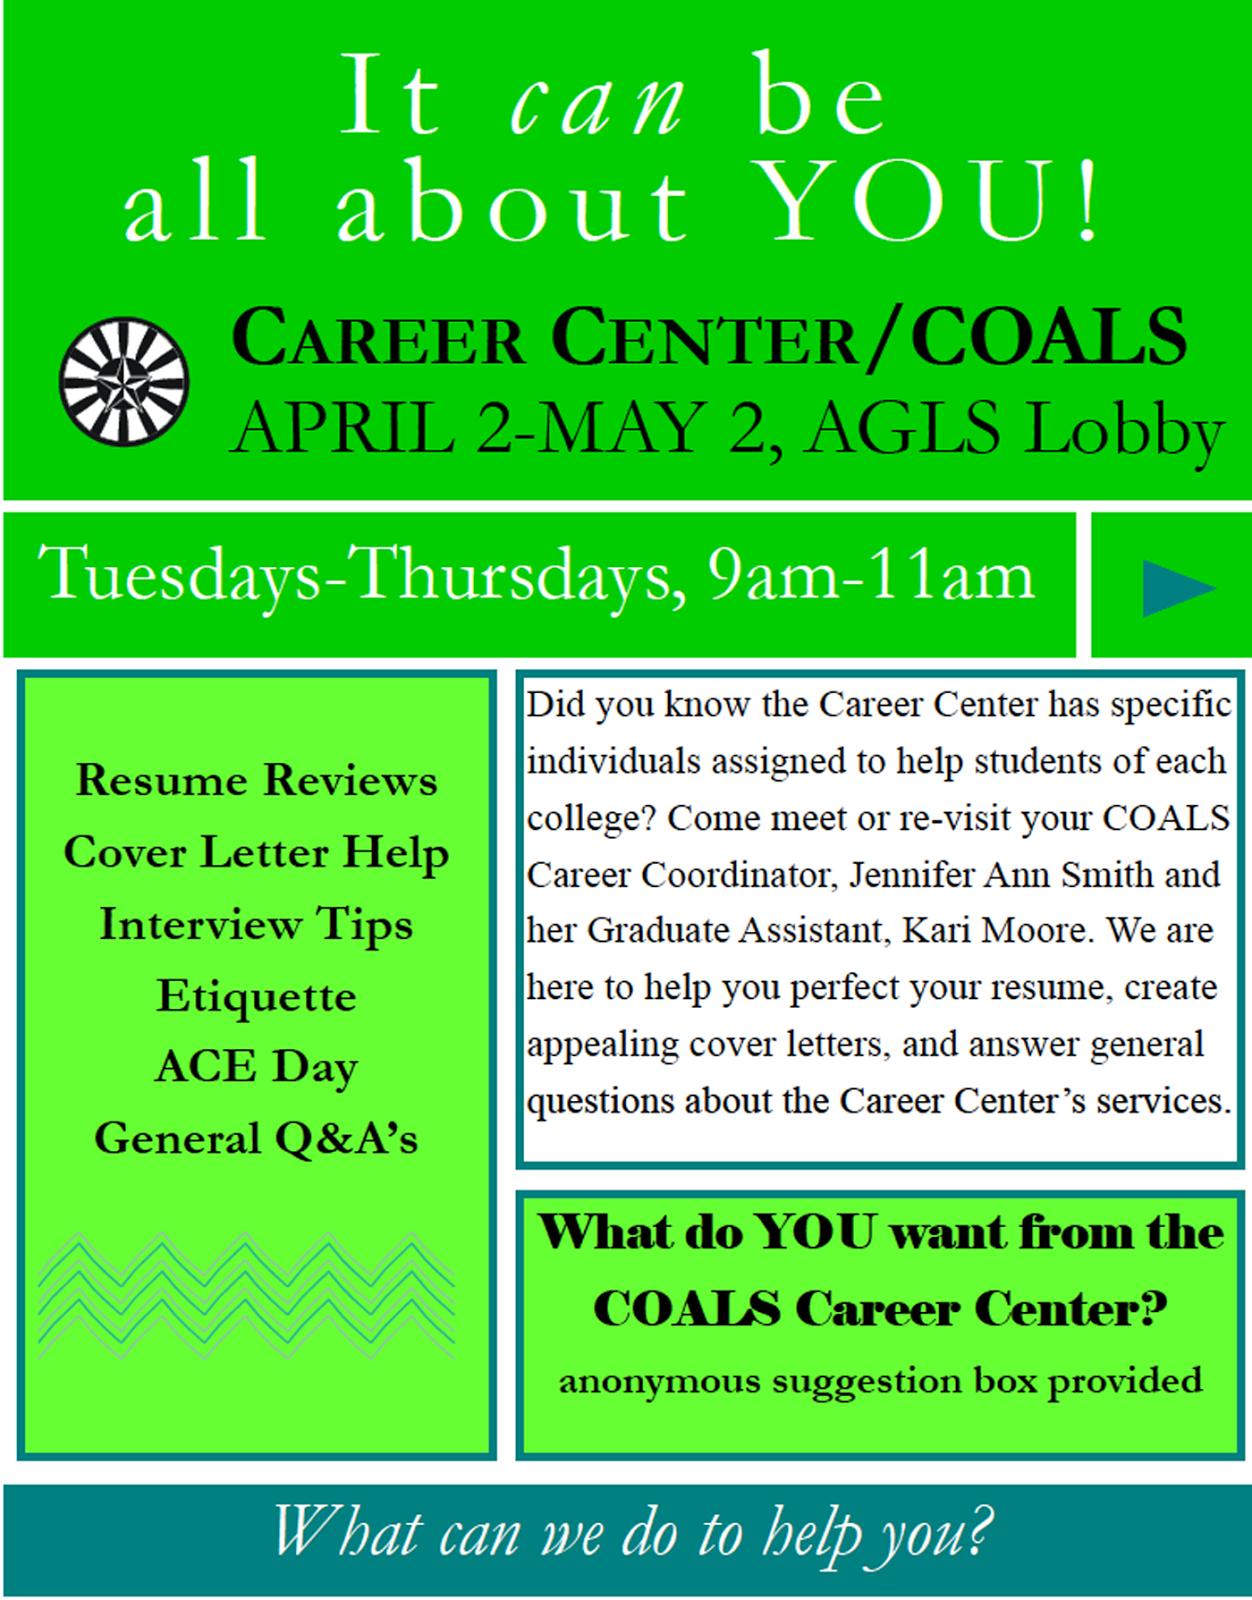 Career Center Help In AGLS Lobby All April Long